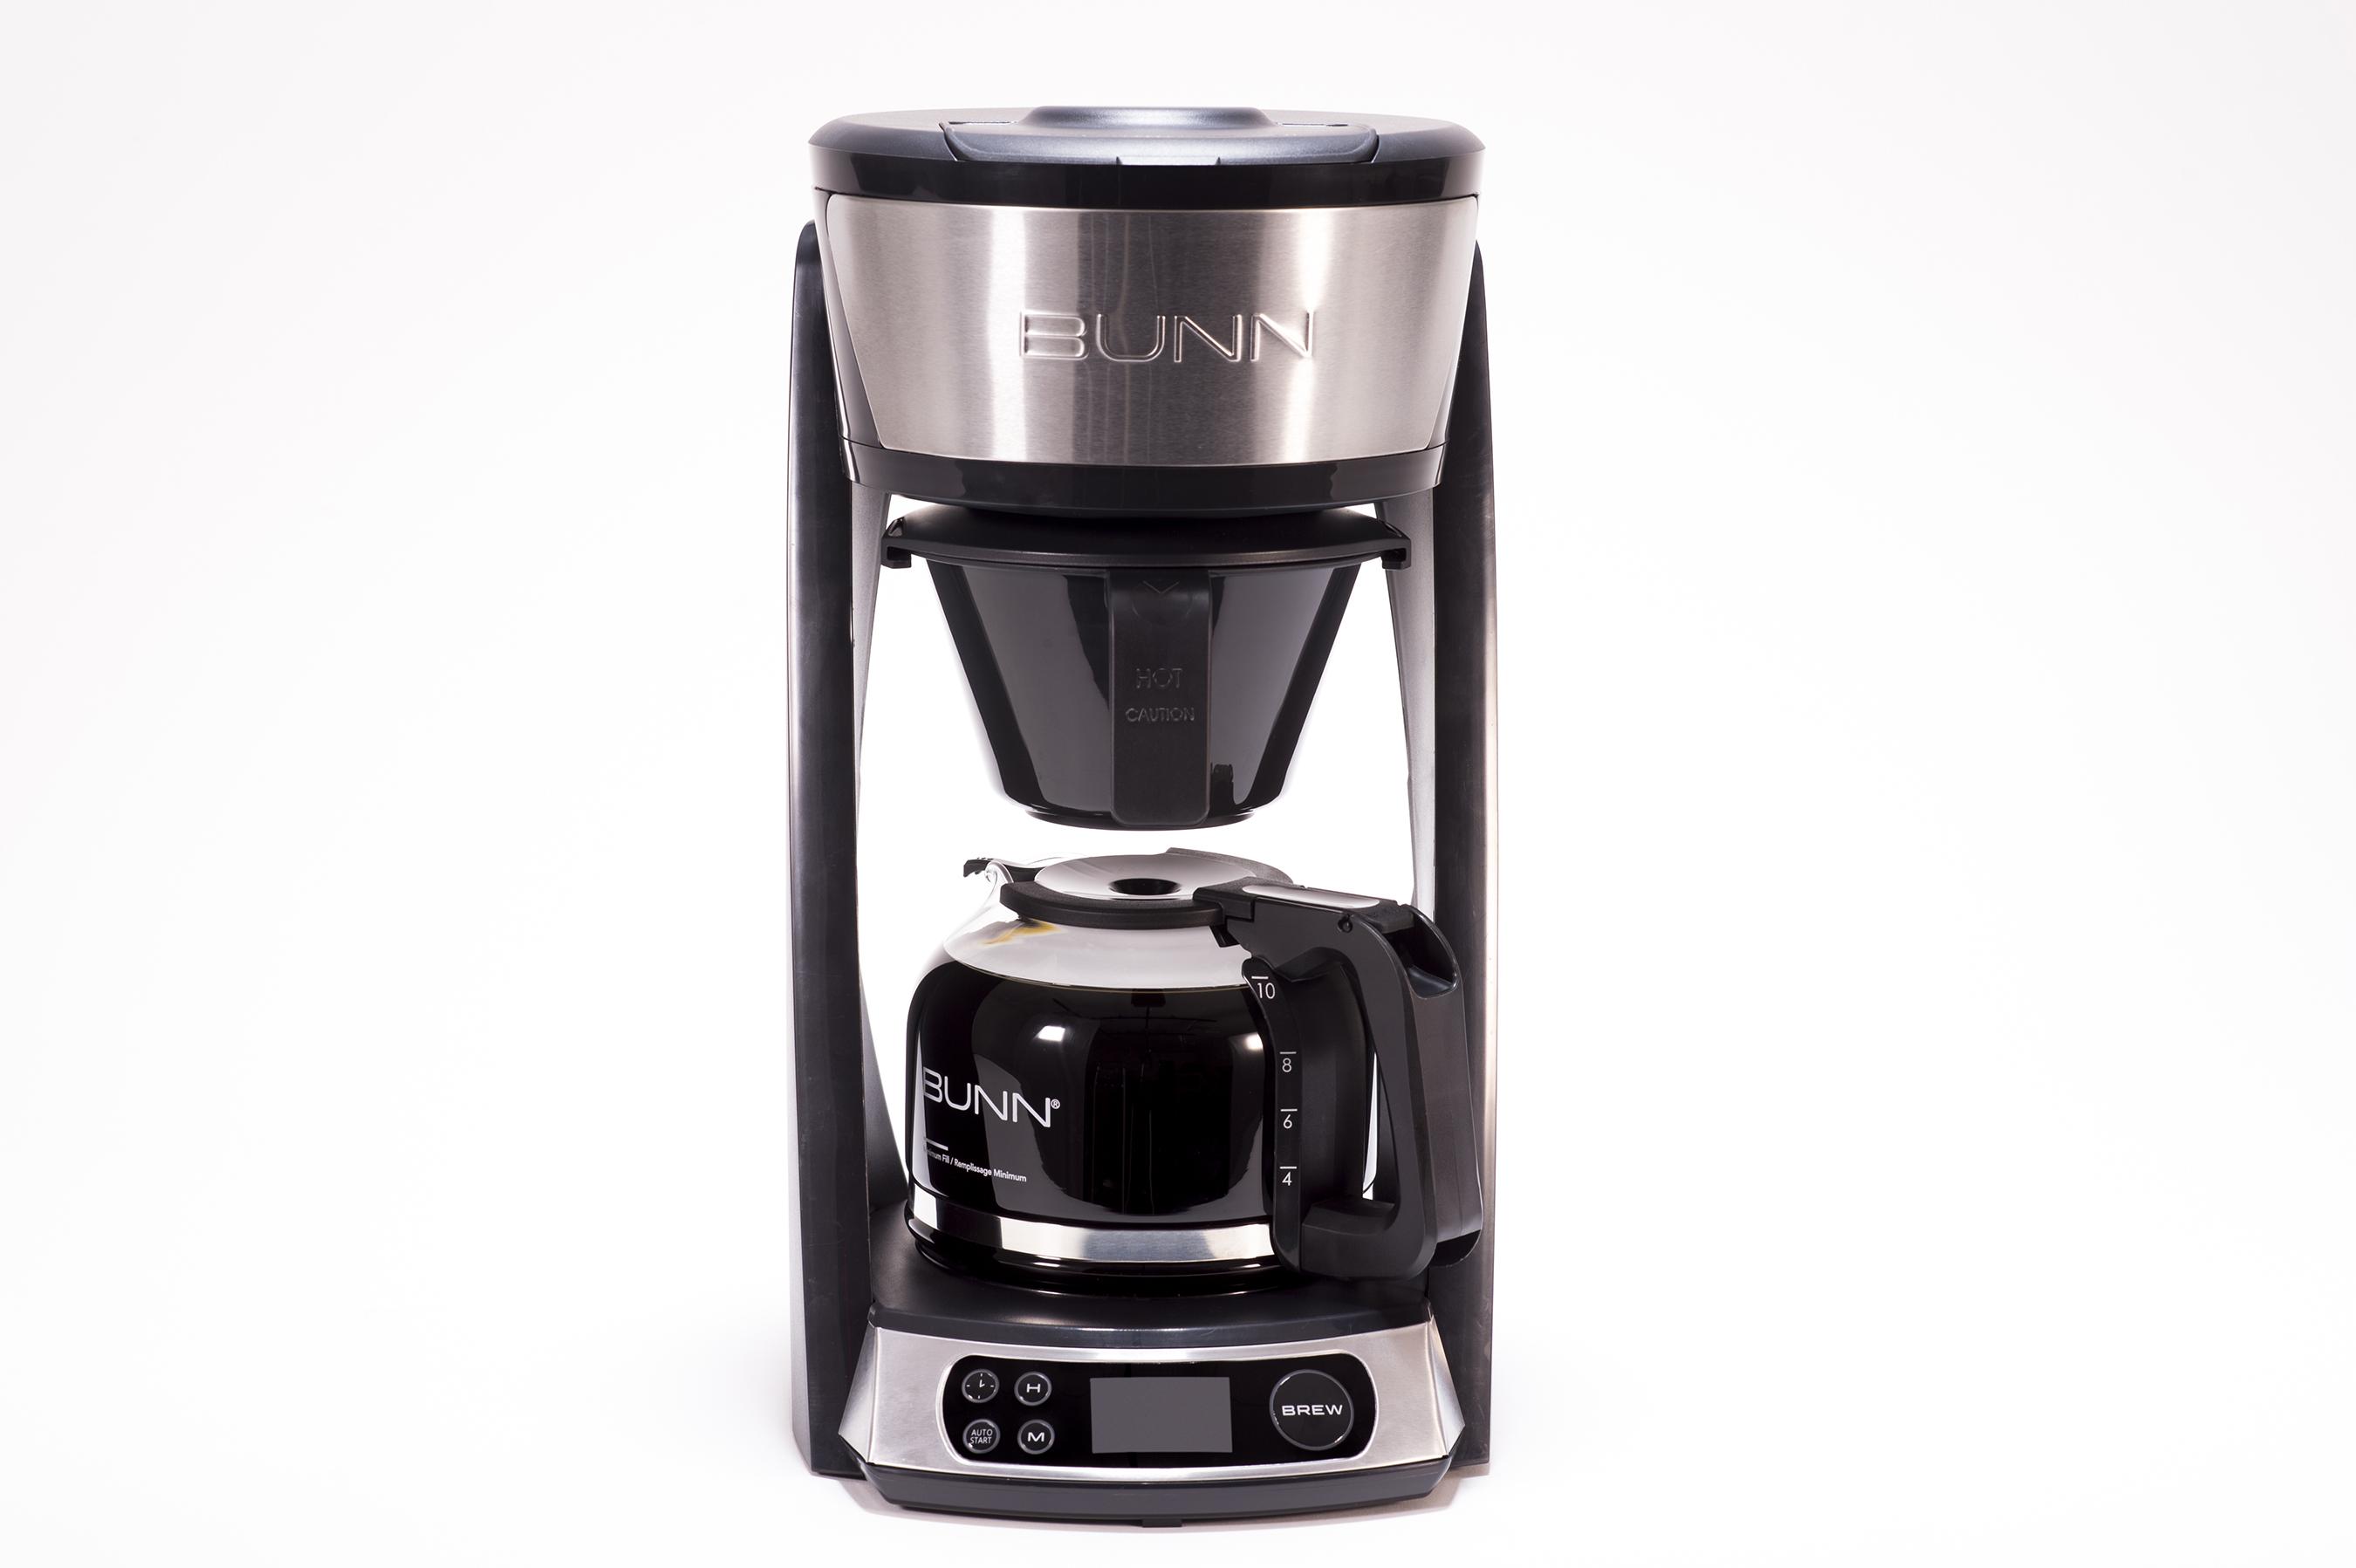 New Bunn 10 Cup Programmable Coffeemaker Helps Coffee